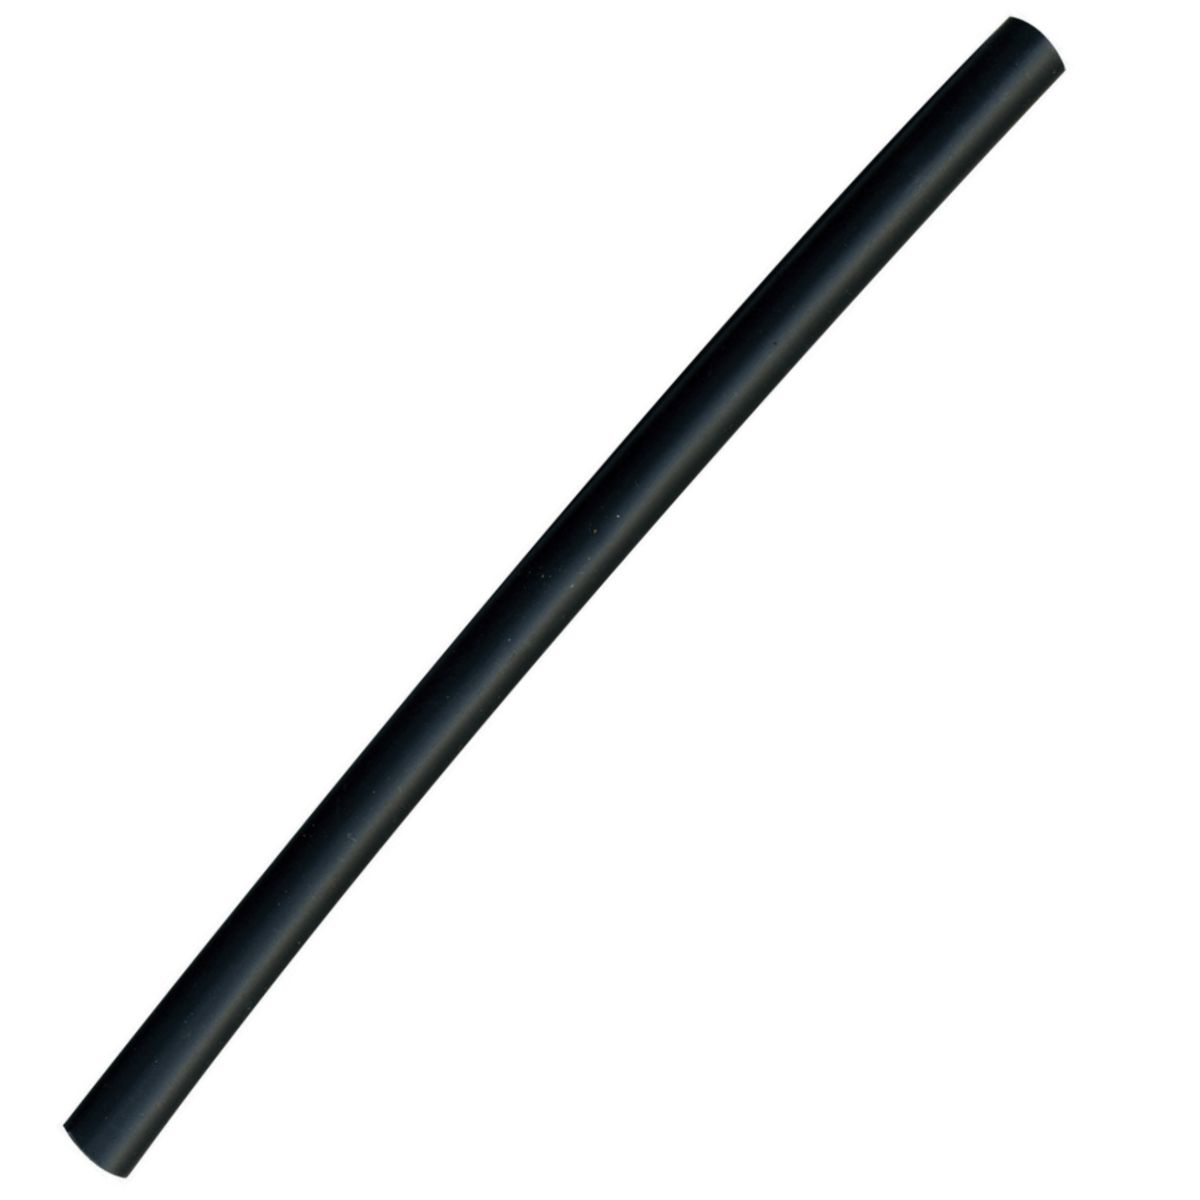 ".187""-.062"" x 6"" 22-12 AWG Flexible Heat Shrink Tube with Sealant, Black 4/PKG"